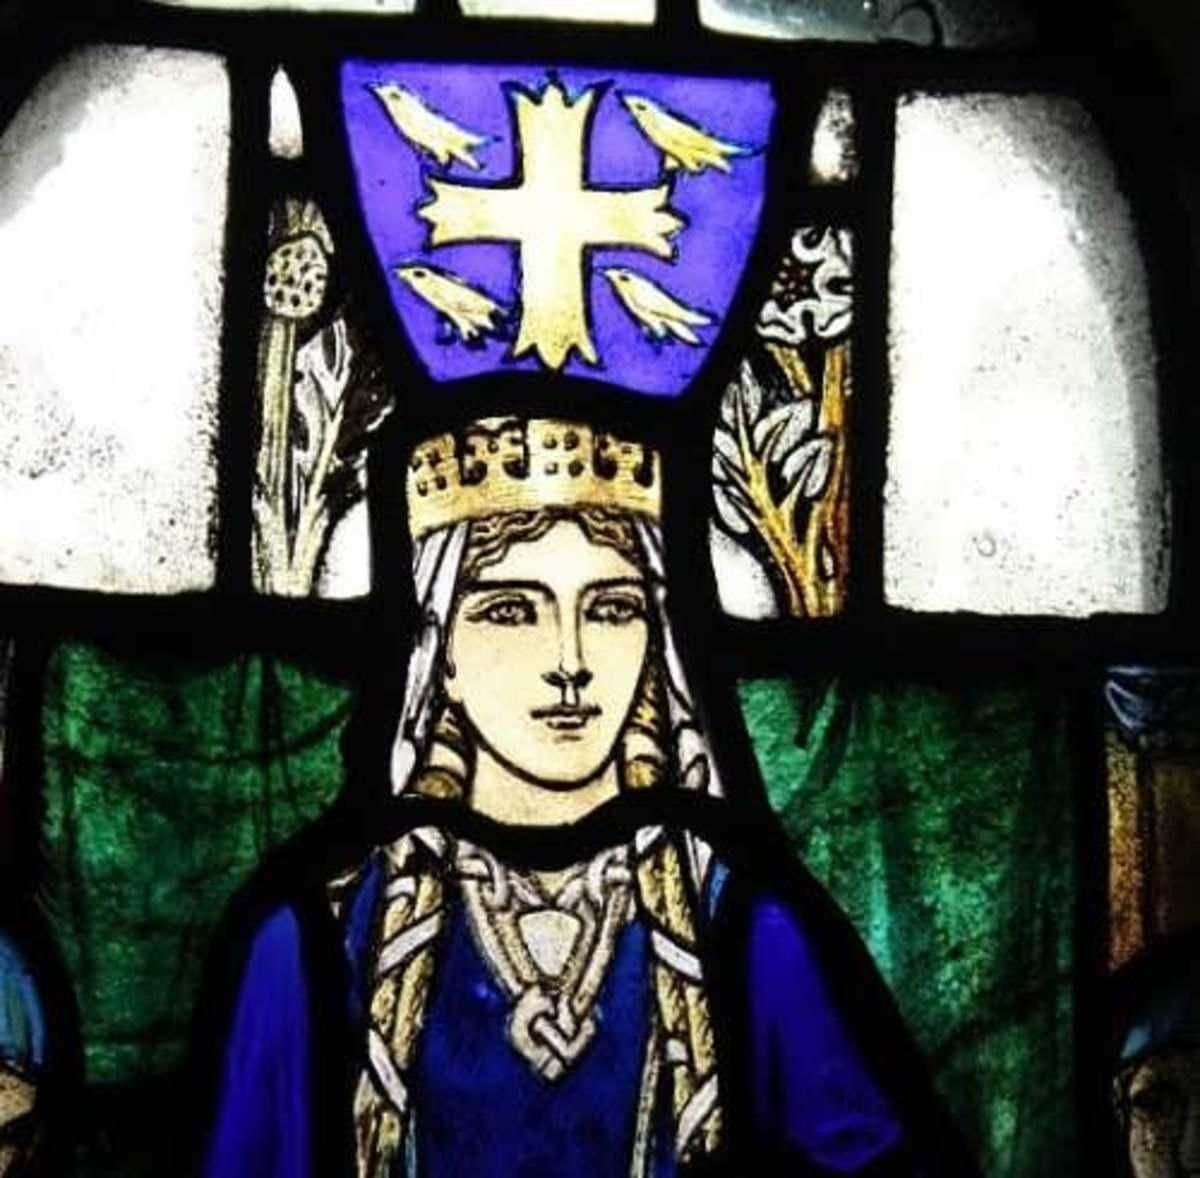 Gytha, grand-daughter of Gytha, given in wedlock by Svein Estrithsson (on Harold's behalf) to Valdemar the Grand Prince of Smolensk and Koenungagard (Kiev)